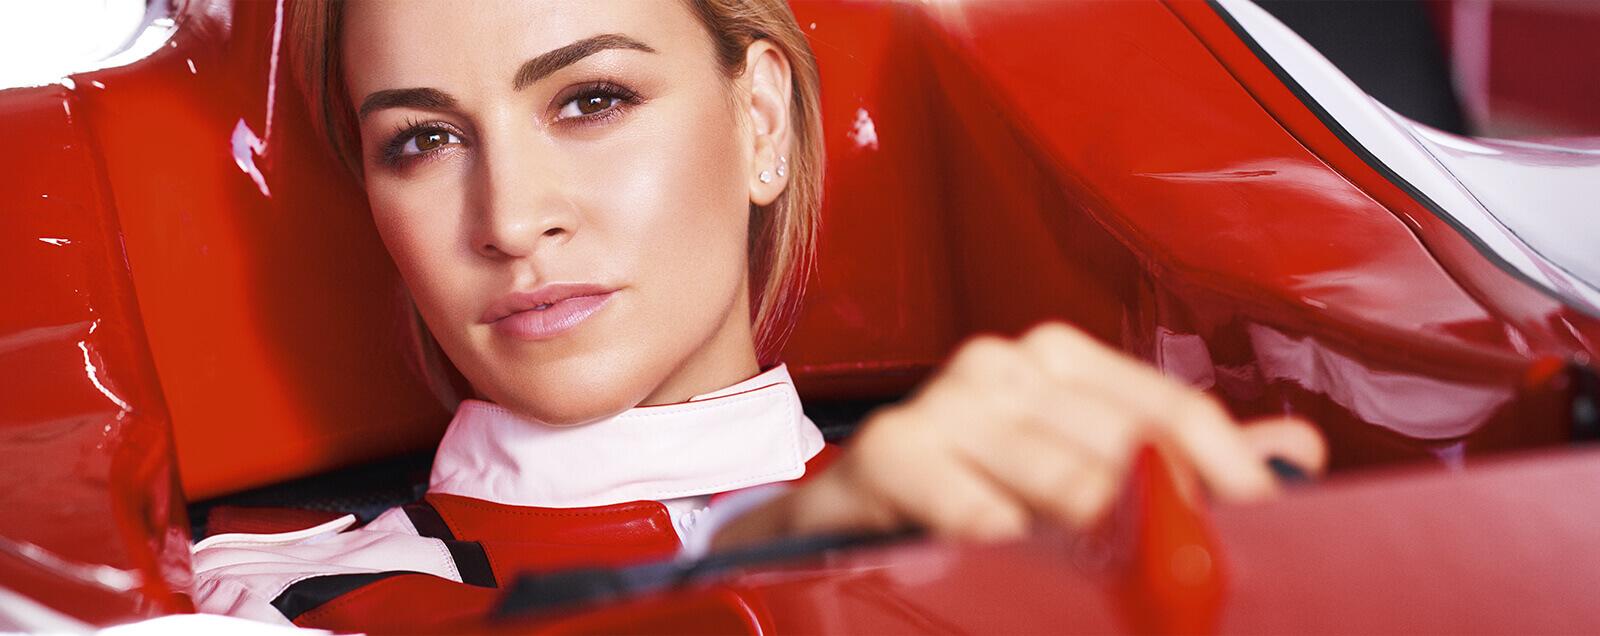 Modelo conduciendo Fórmula 1